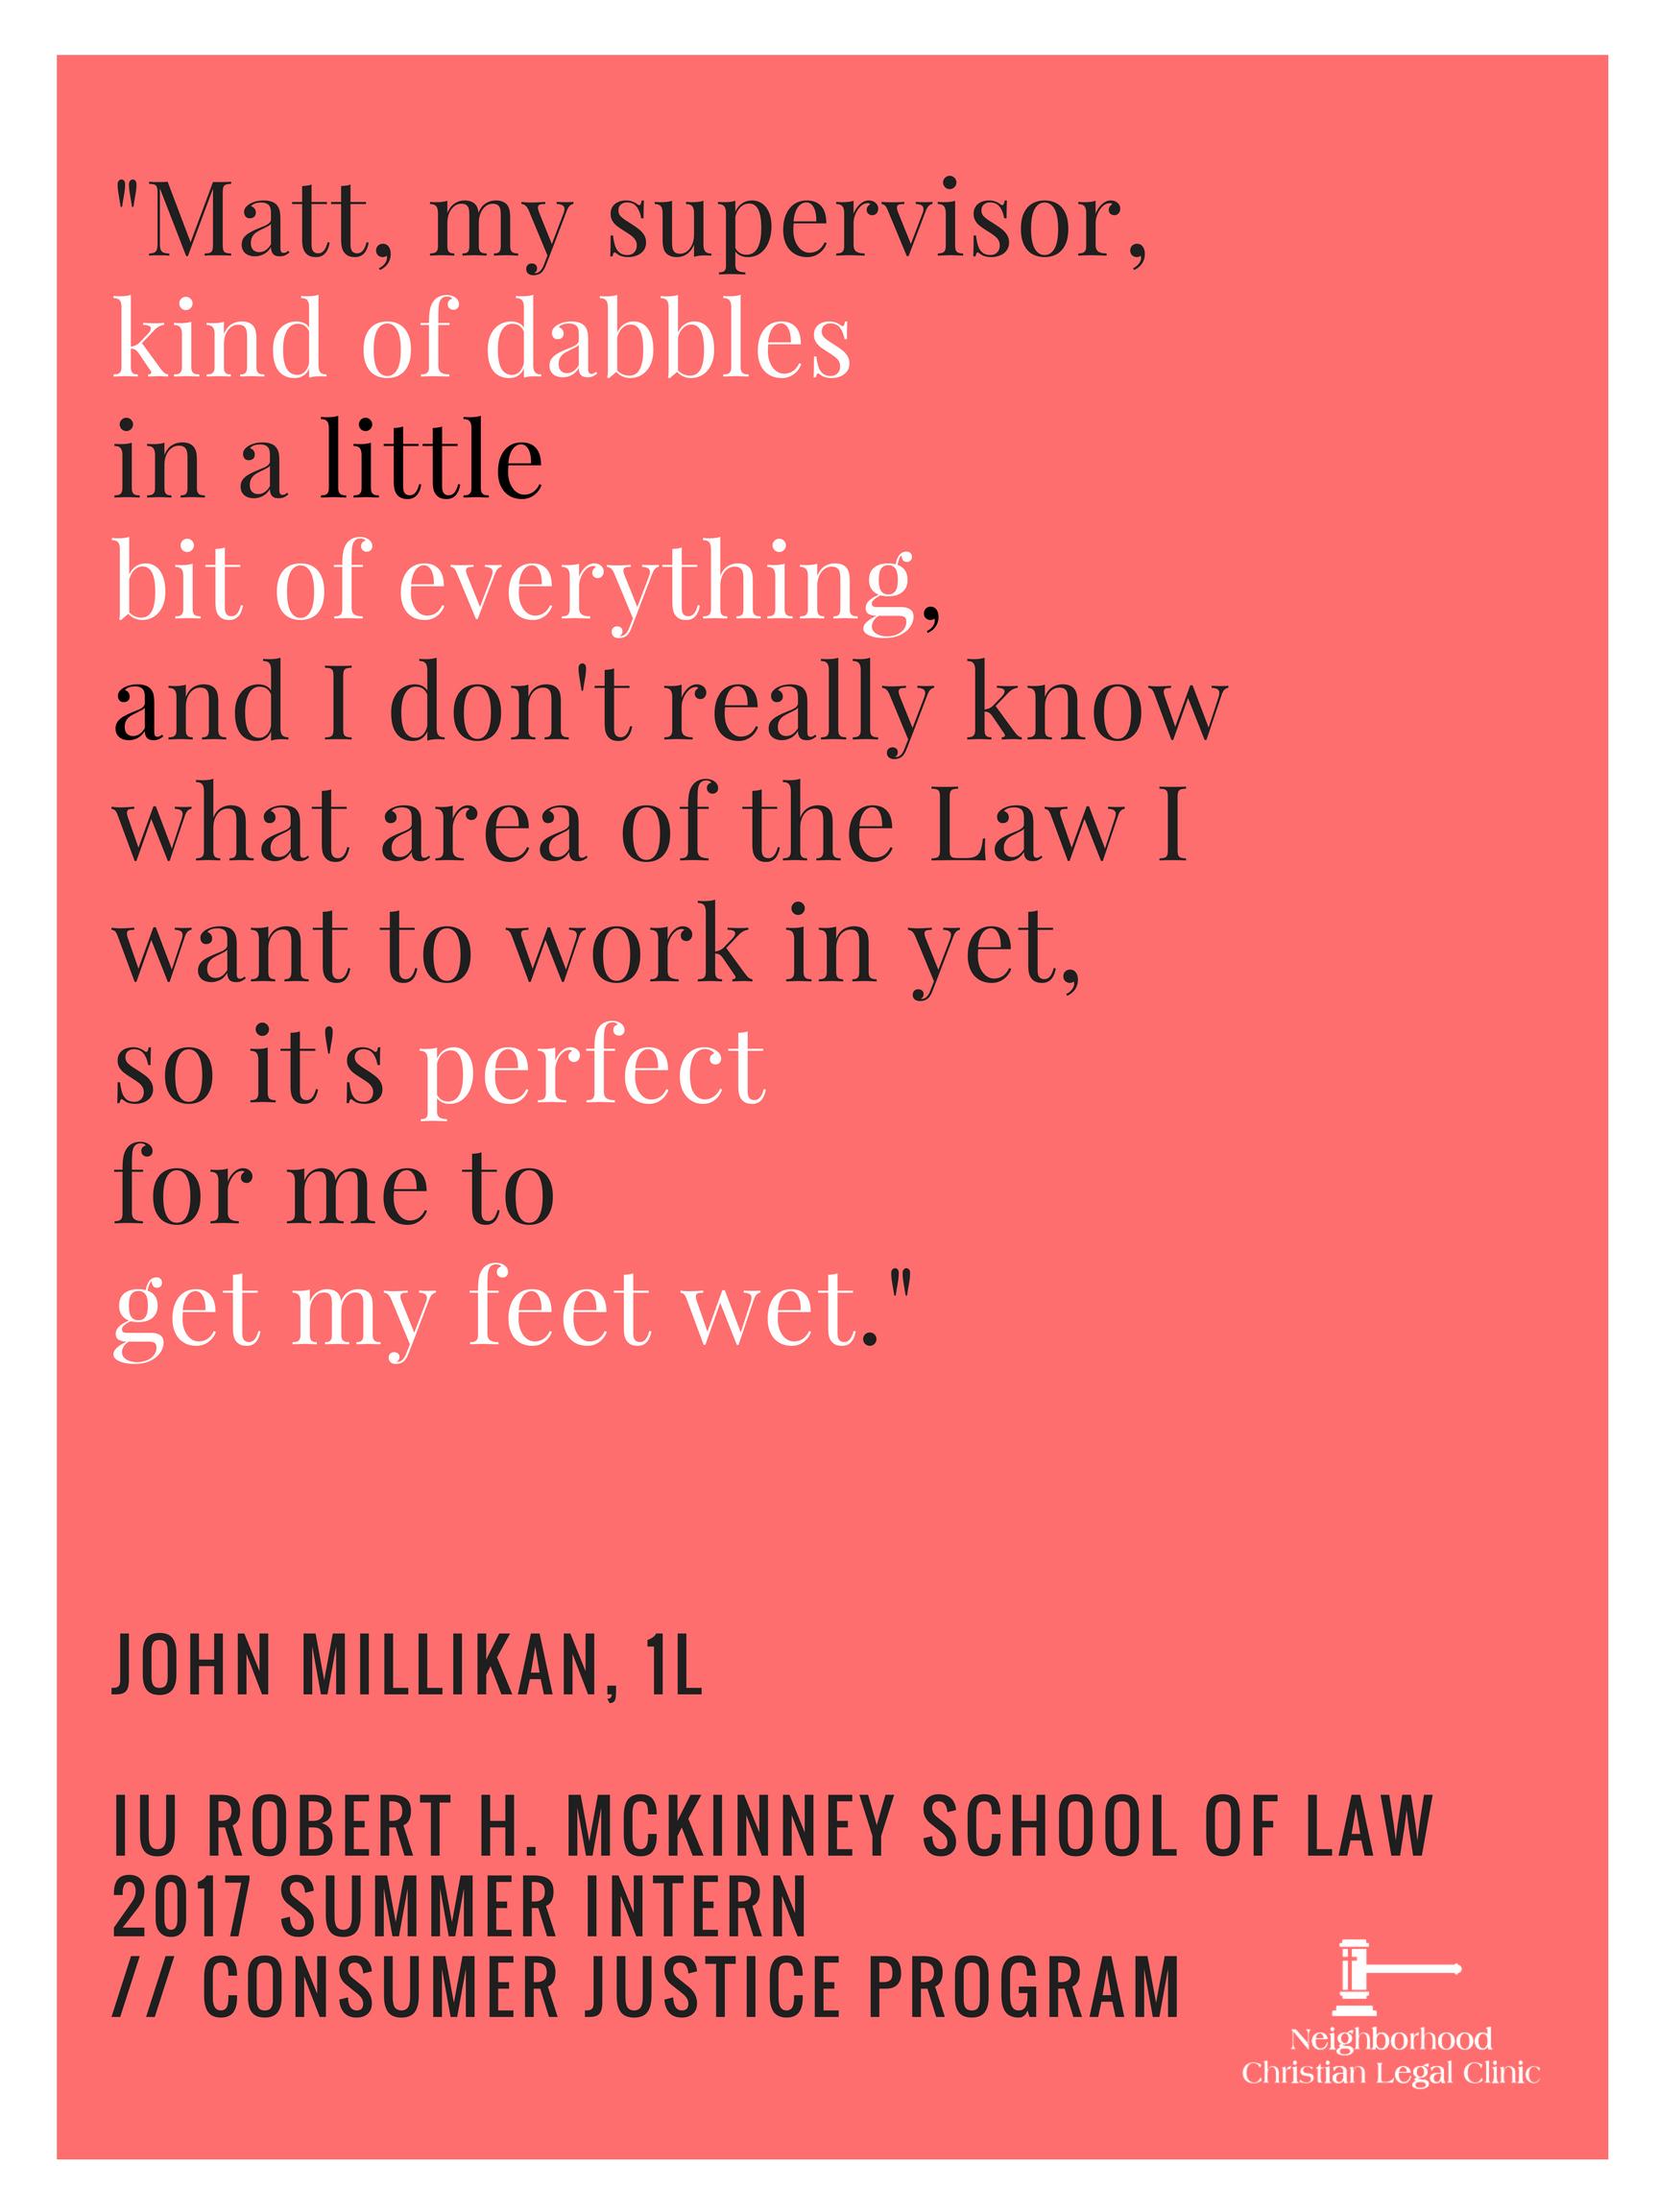 2017 Summer Intern Quote - John Millikan - Canva.png